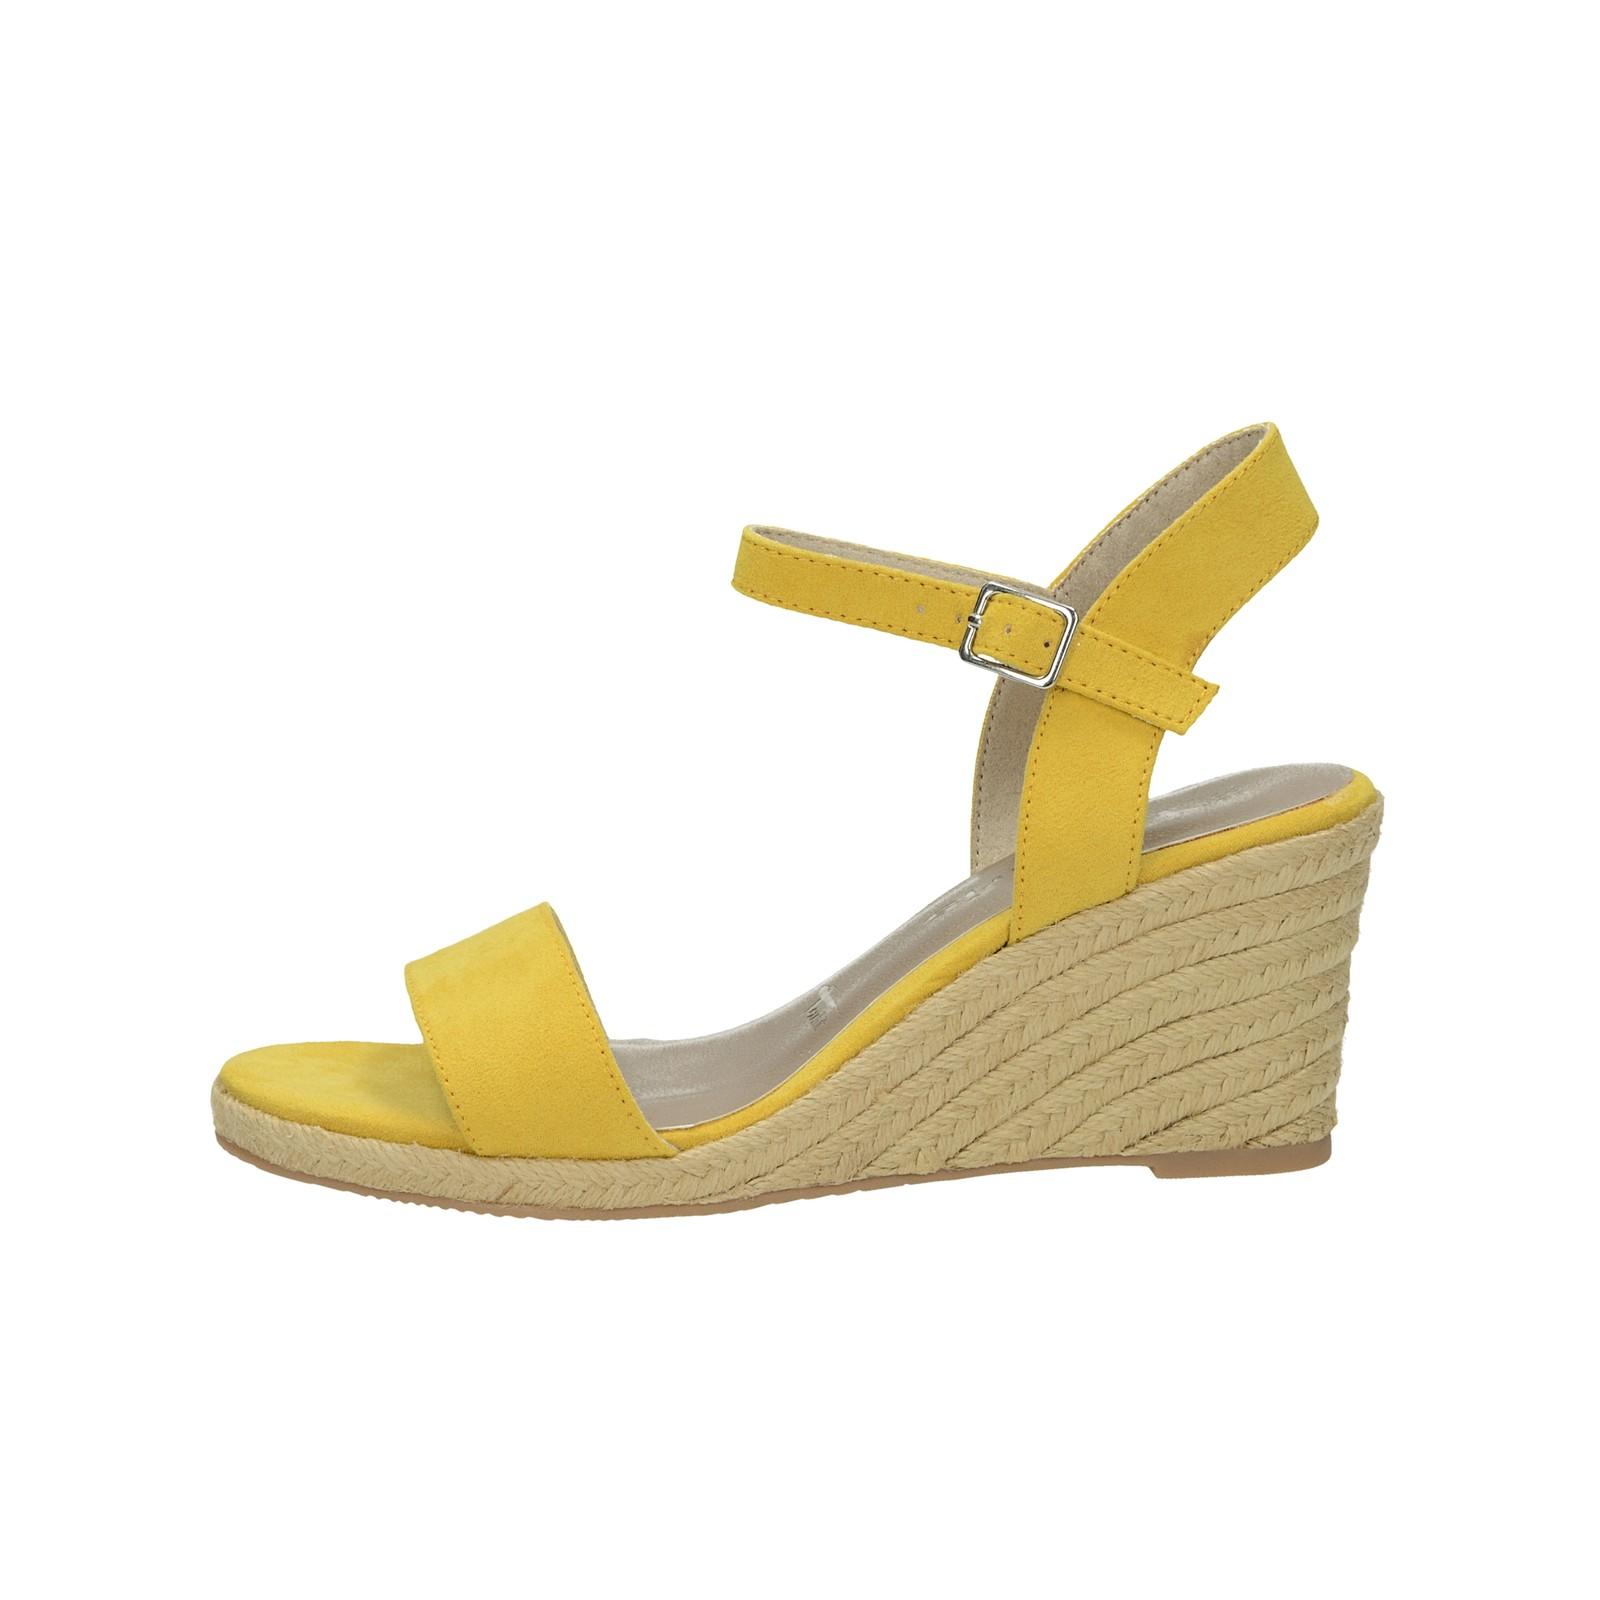 595cf2cc4da4 ... Tamaris dámské stylové sandály na klinové podrážce -žluté ...